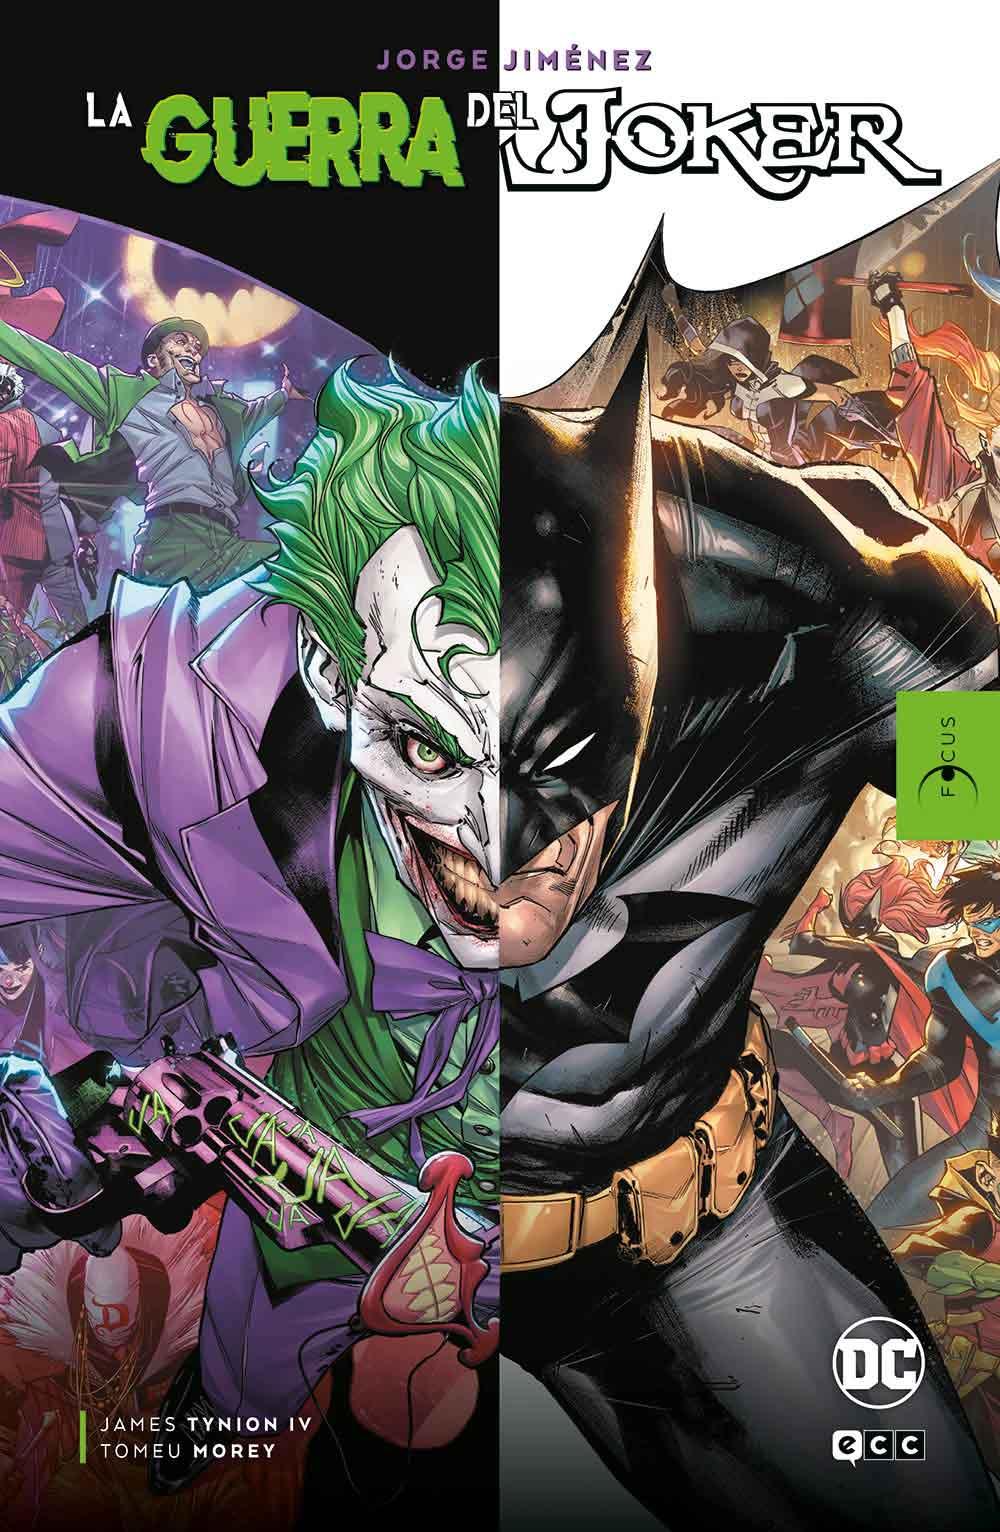 Focus Jorge Jimenez La guerra del Joker